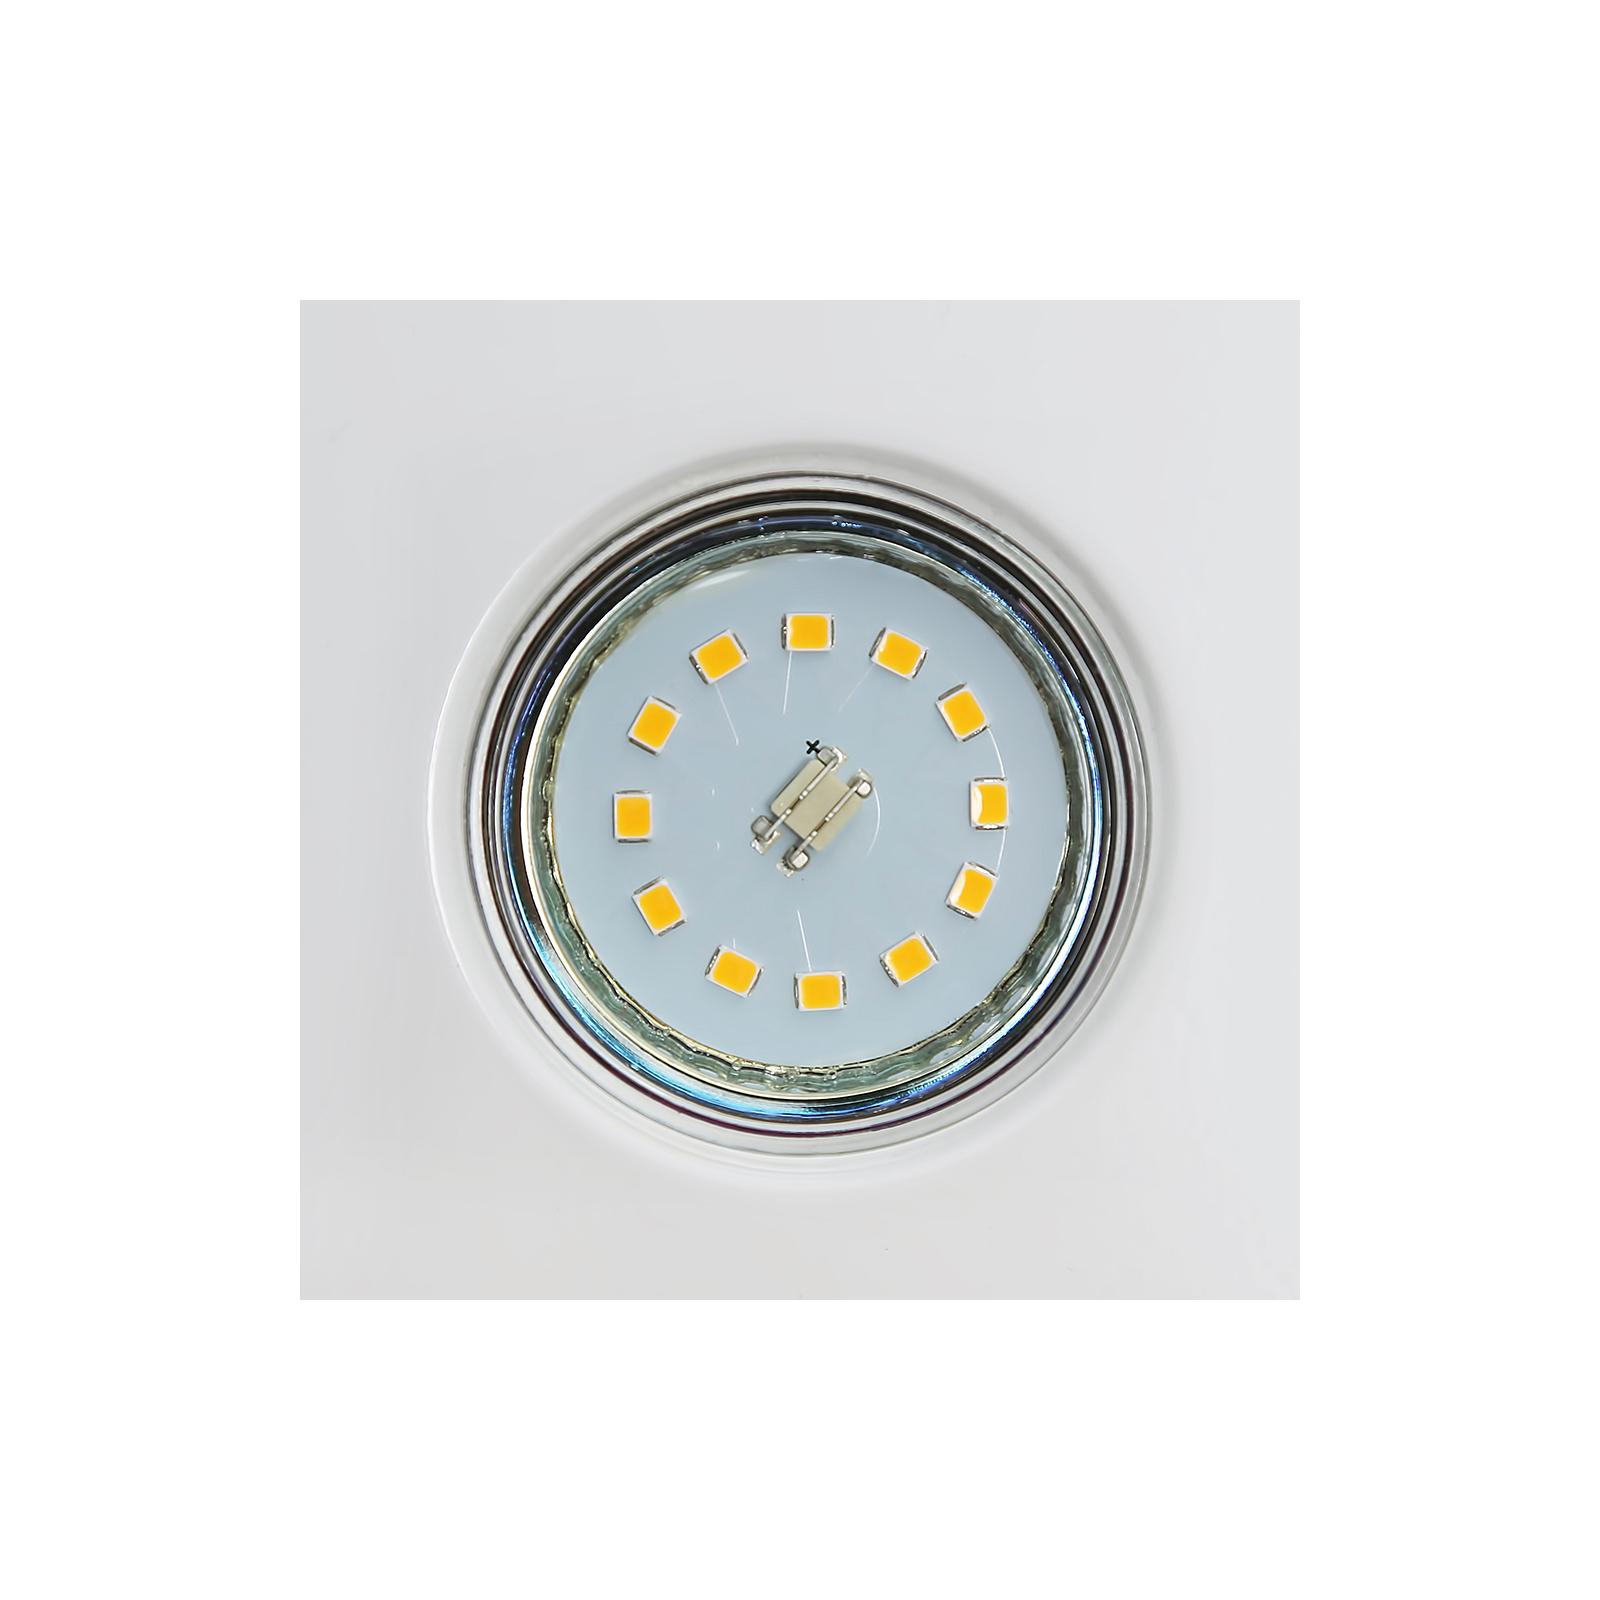 Вытяжка кухонная PERFELLI TLS 6832 W LED изображение 8